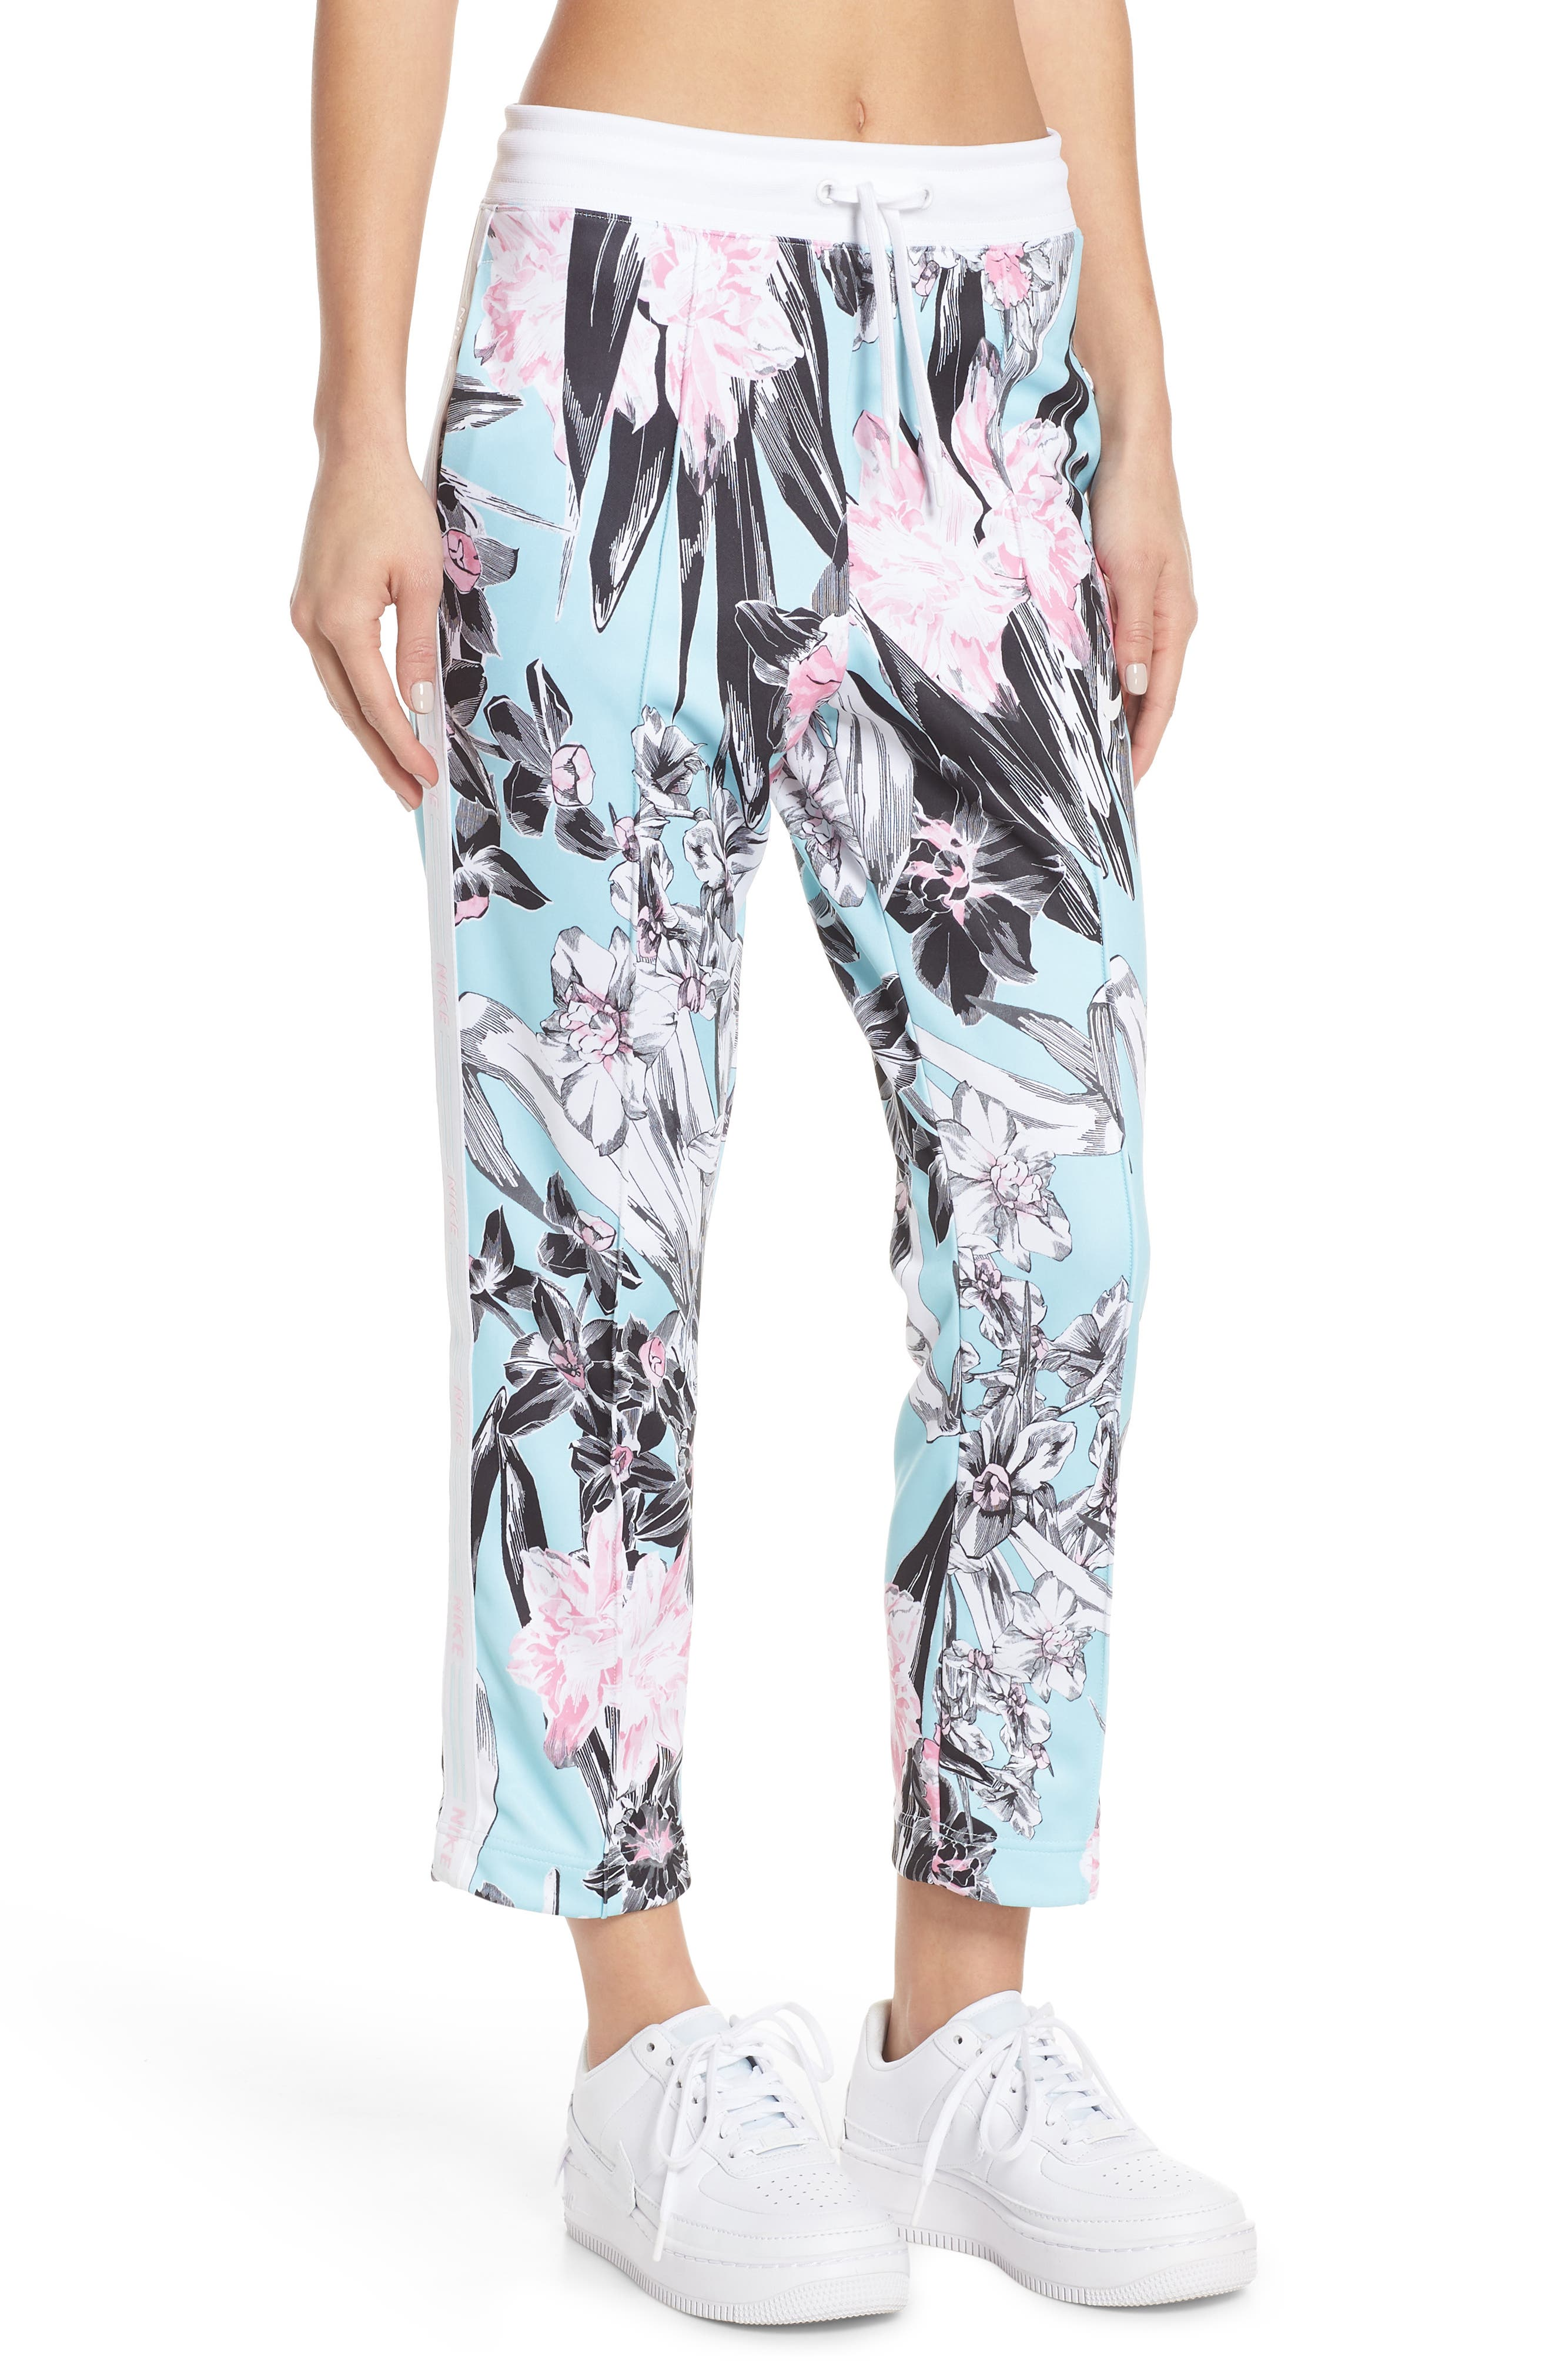 NIKE Sportswear Floral Print Pants, Main, color, TOPAZ MIST/ WHITE/ WHITE